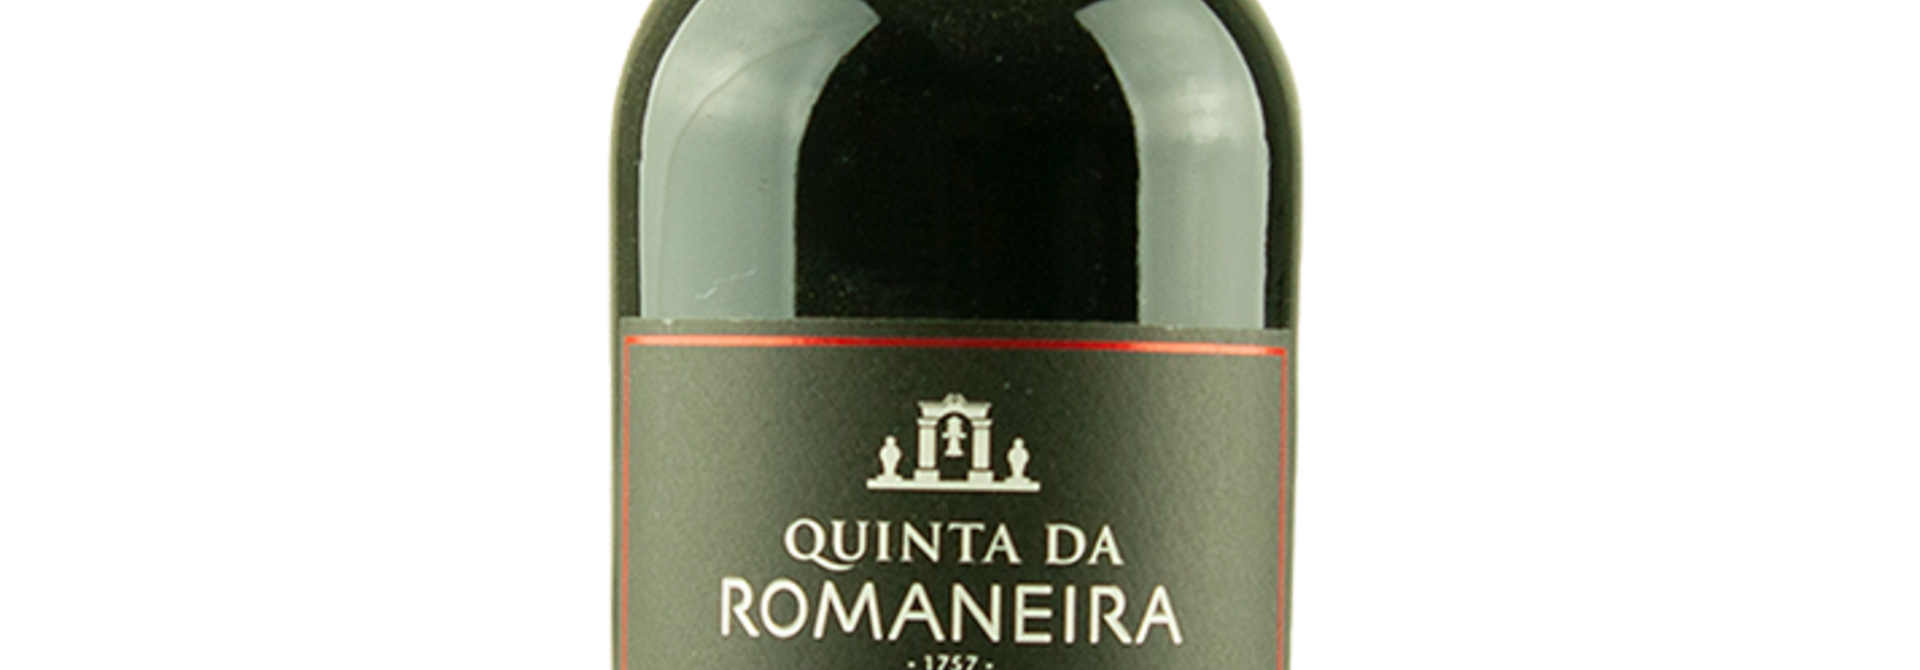 Quinta da Romaneira Vintage Port 2016